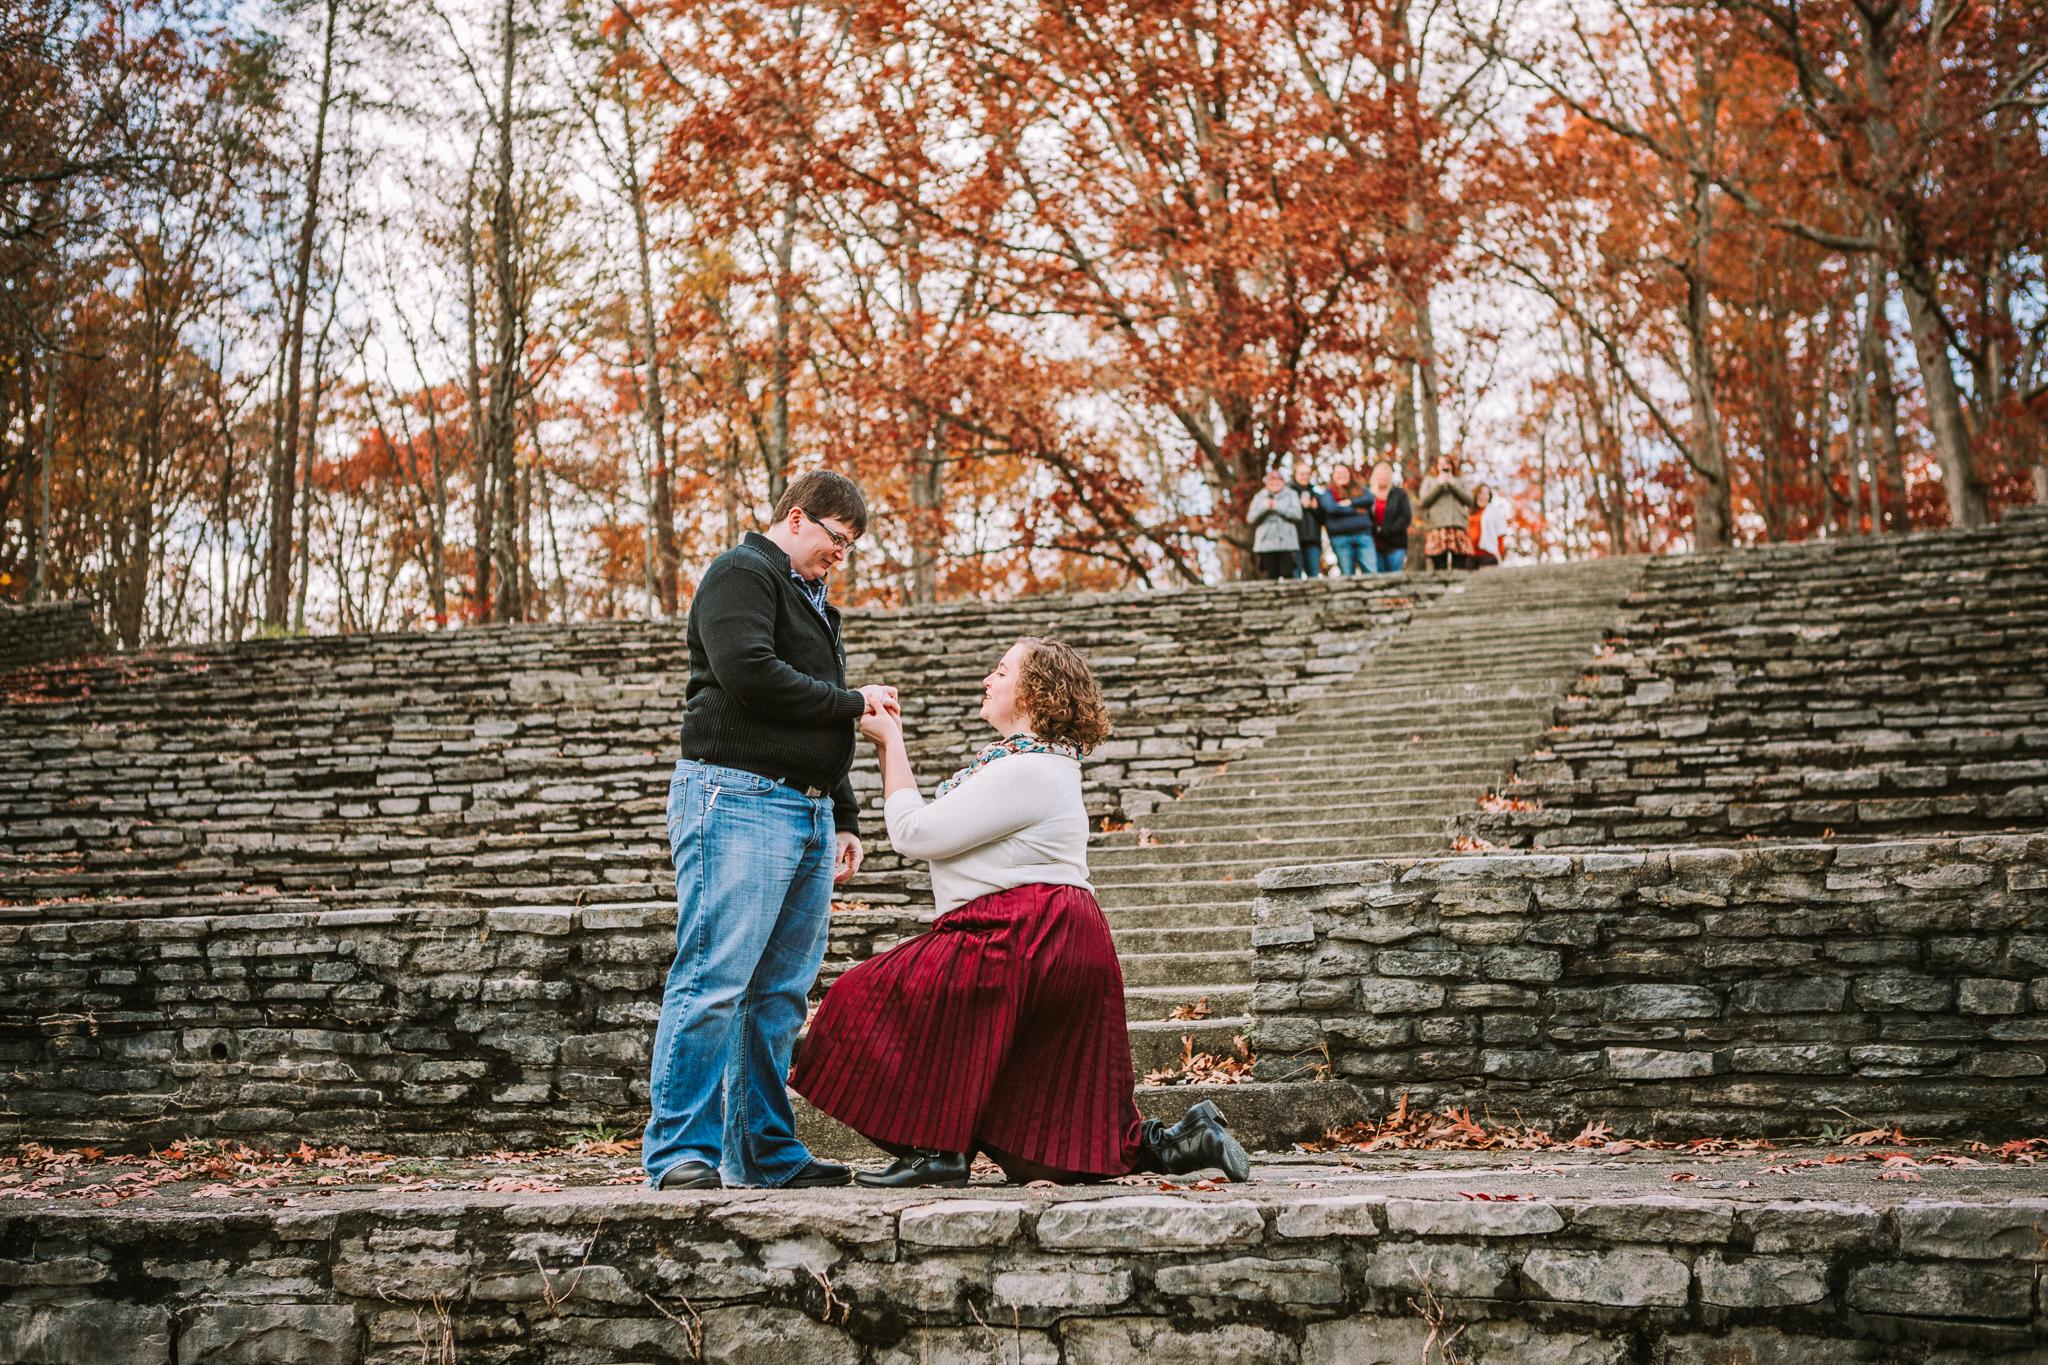 Richmond Kentucky Engagement Photographer - Ariana Jordan Photography -31.jpg